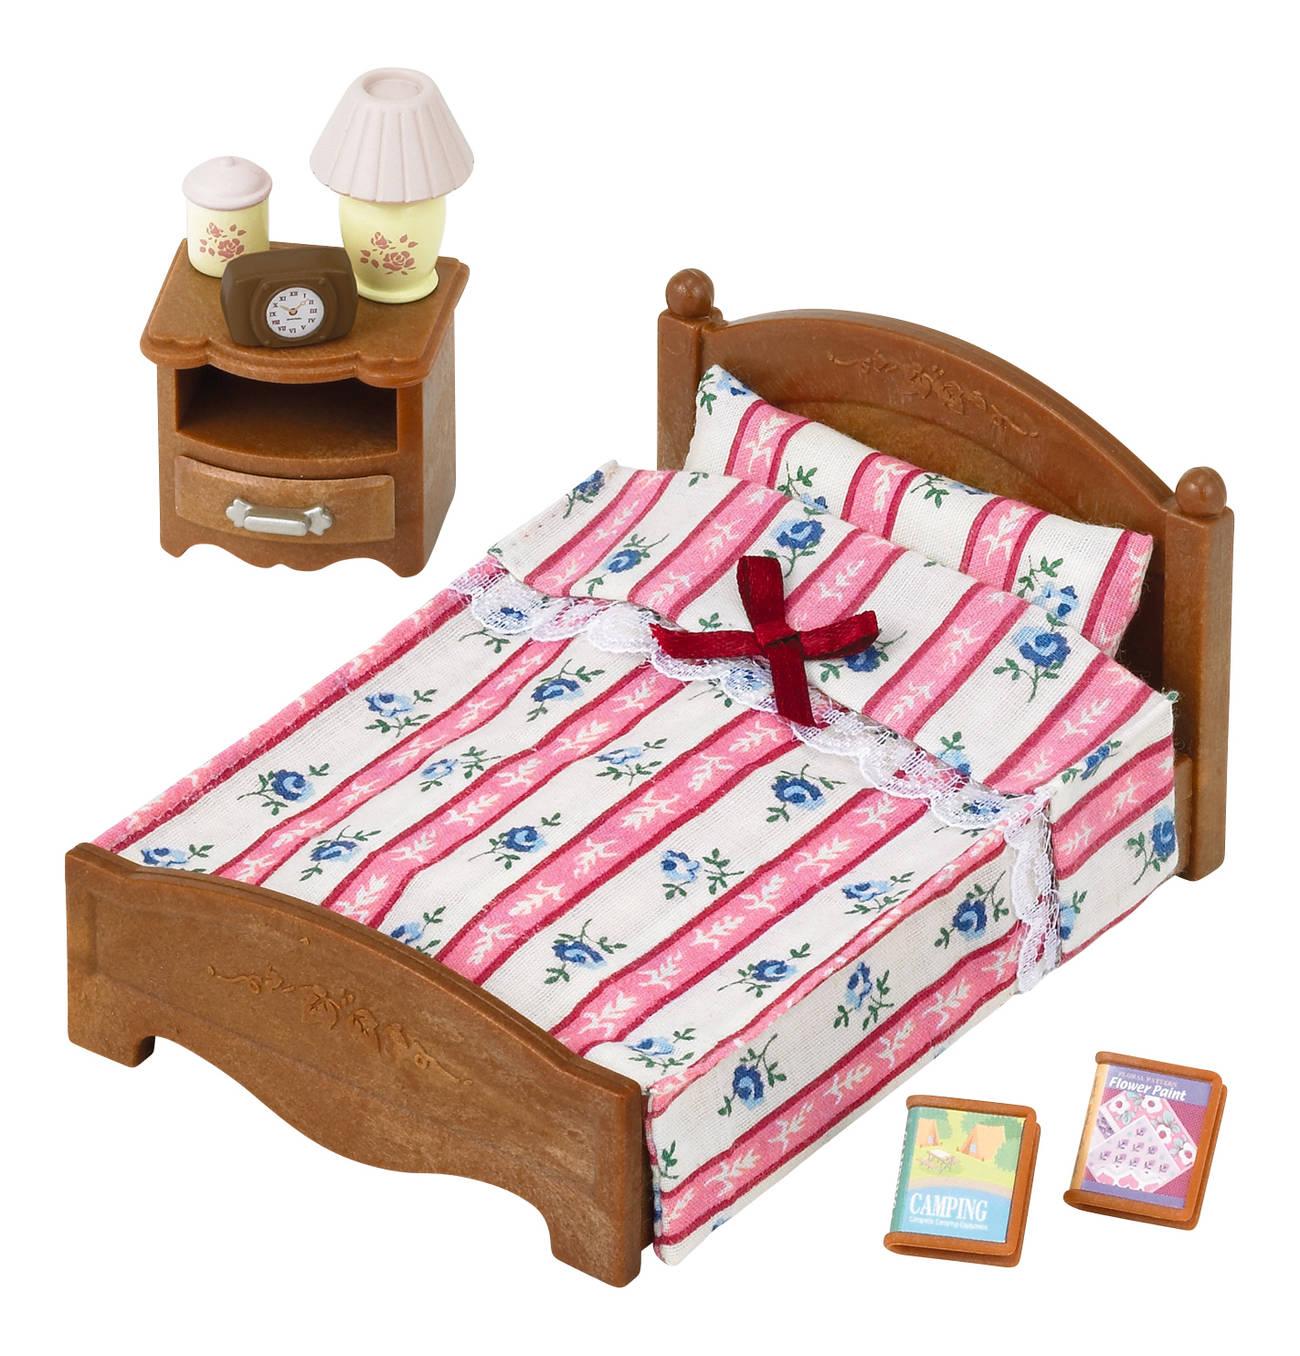 Doppelbett Bett ideen, Doppelbett und Doppelbetten